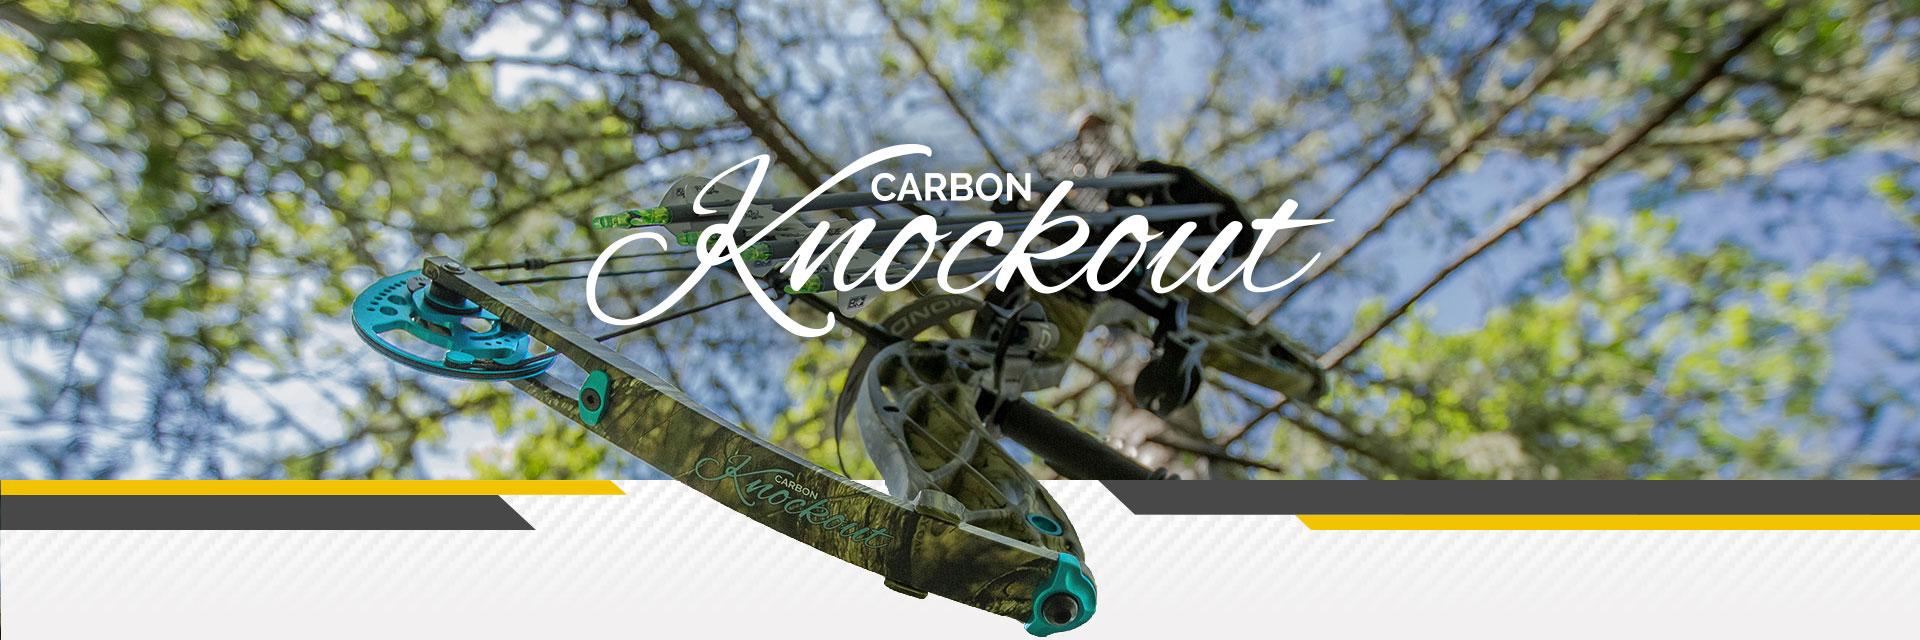 carbon knockout lifestyle header image